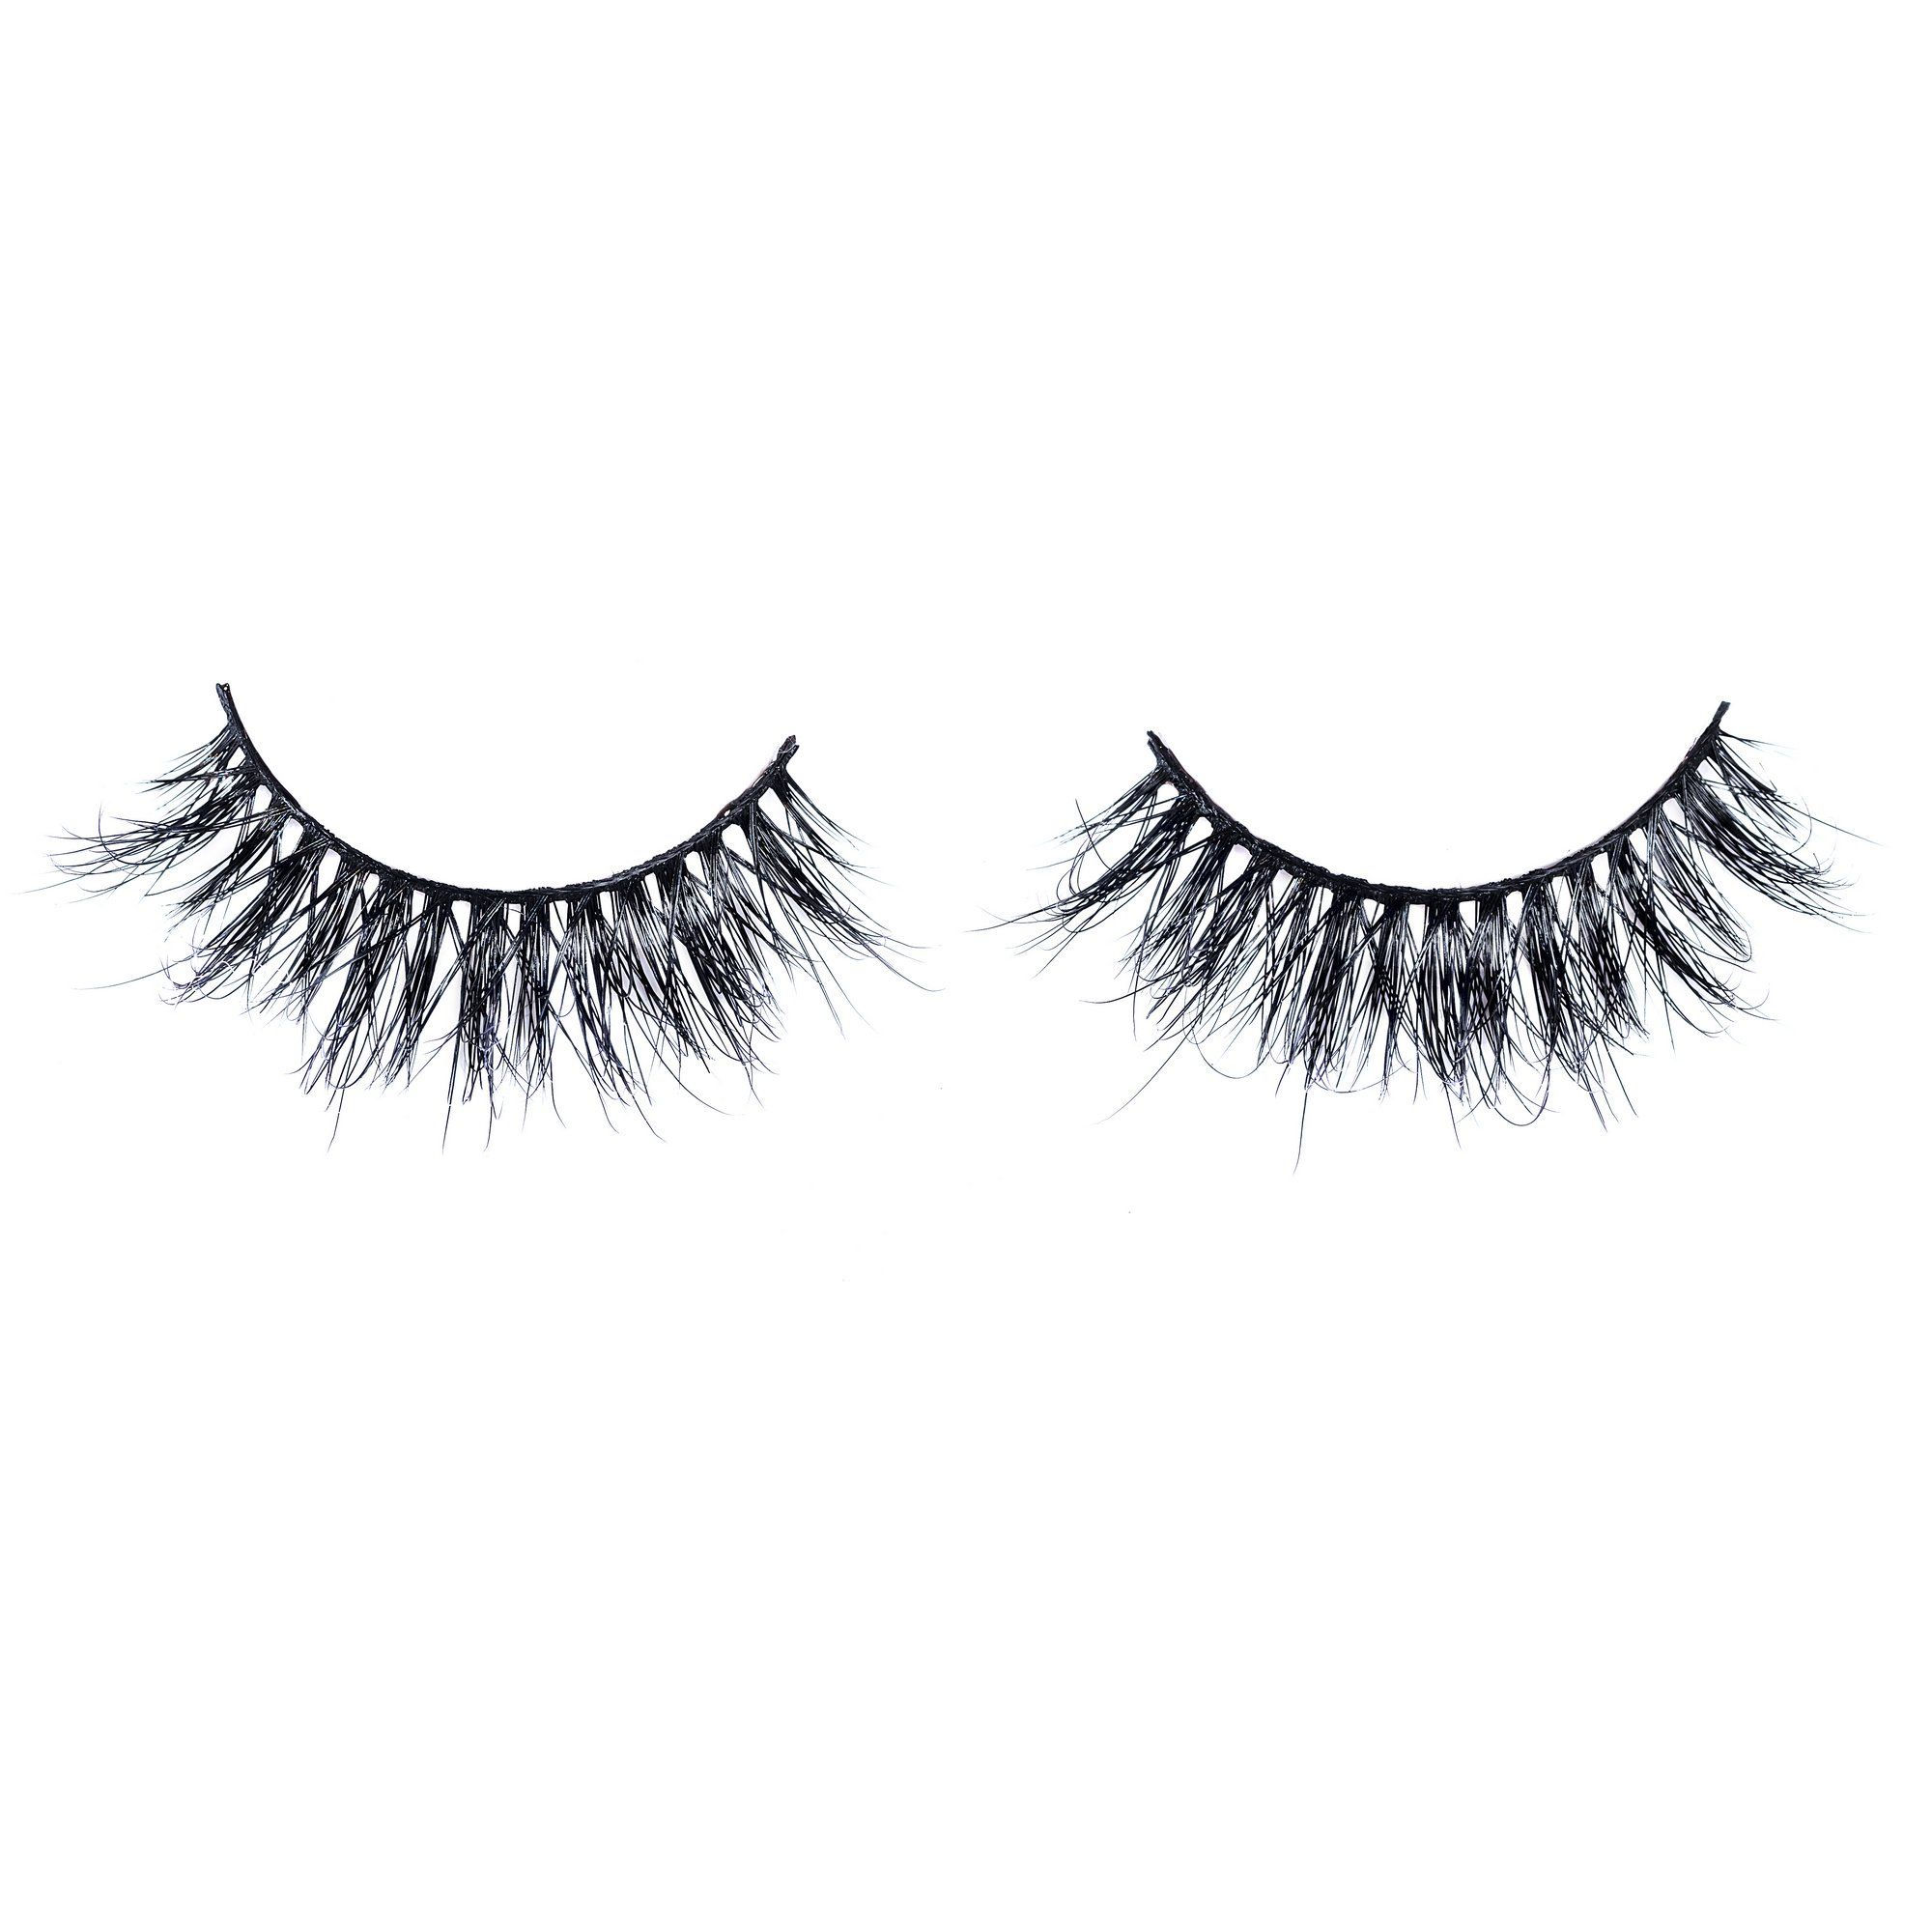 52035b15ca2 Flirty Mink Lashes | Buy the Best False Eyelashes | Mink Eye Lashes – Lavaa  Lashes - Flirty Lashes #crueltyfree #indiebeauty #minklashes #lavaalashes